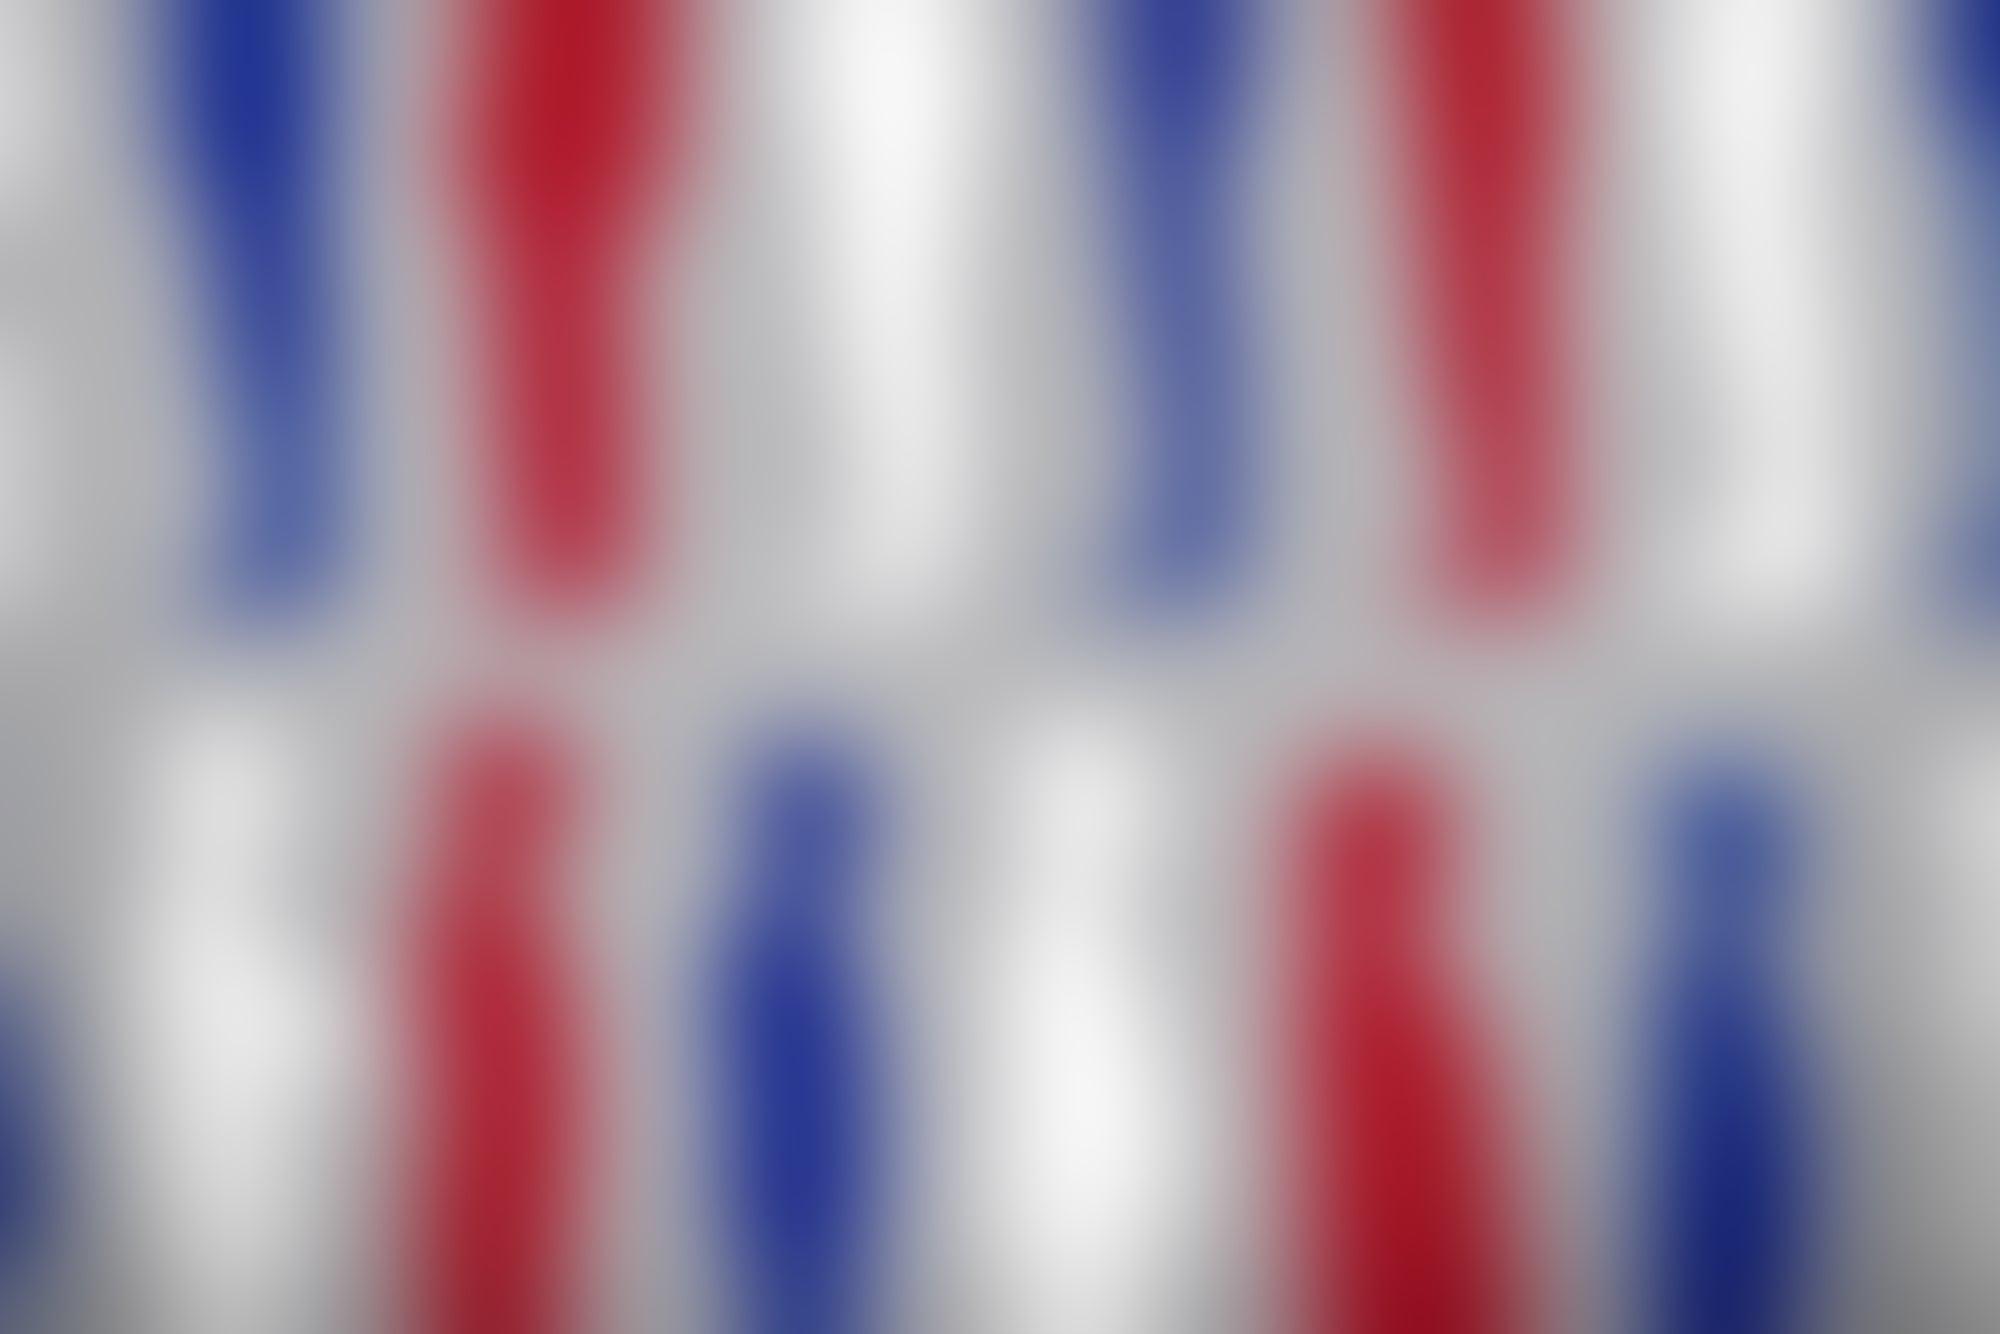 White House Plays Offense: Says Immigration Reform Will Turbocharge Entrepreneurship